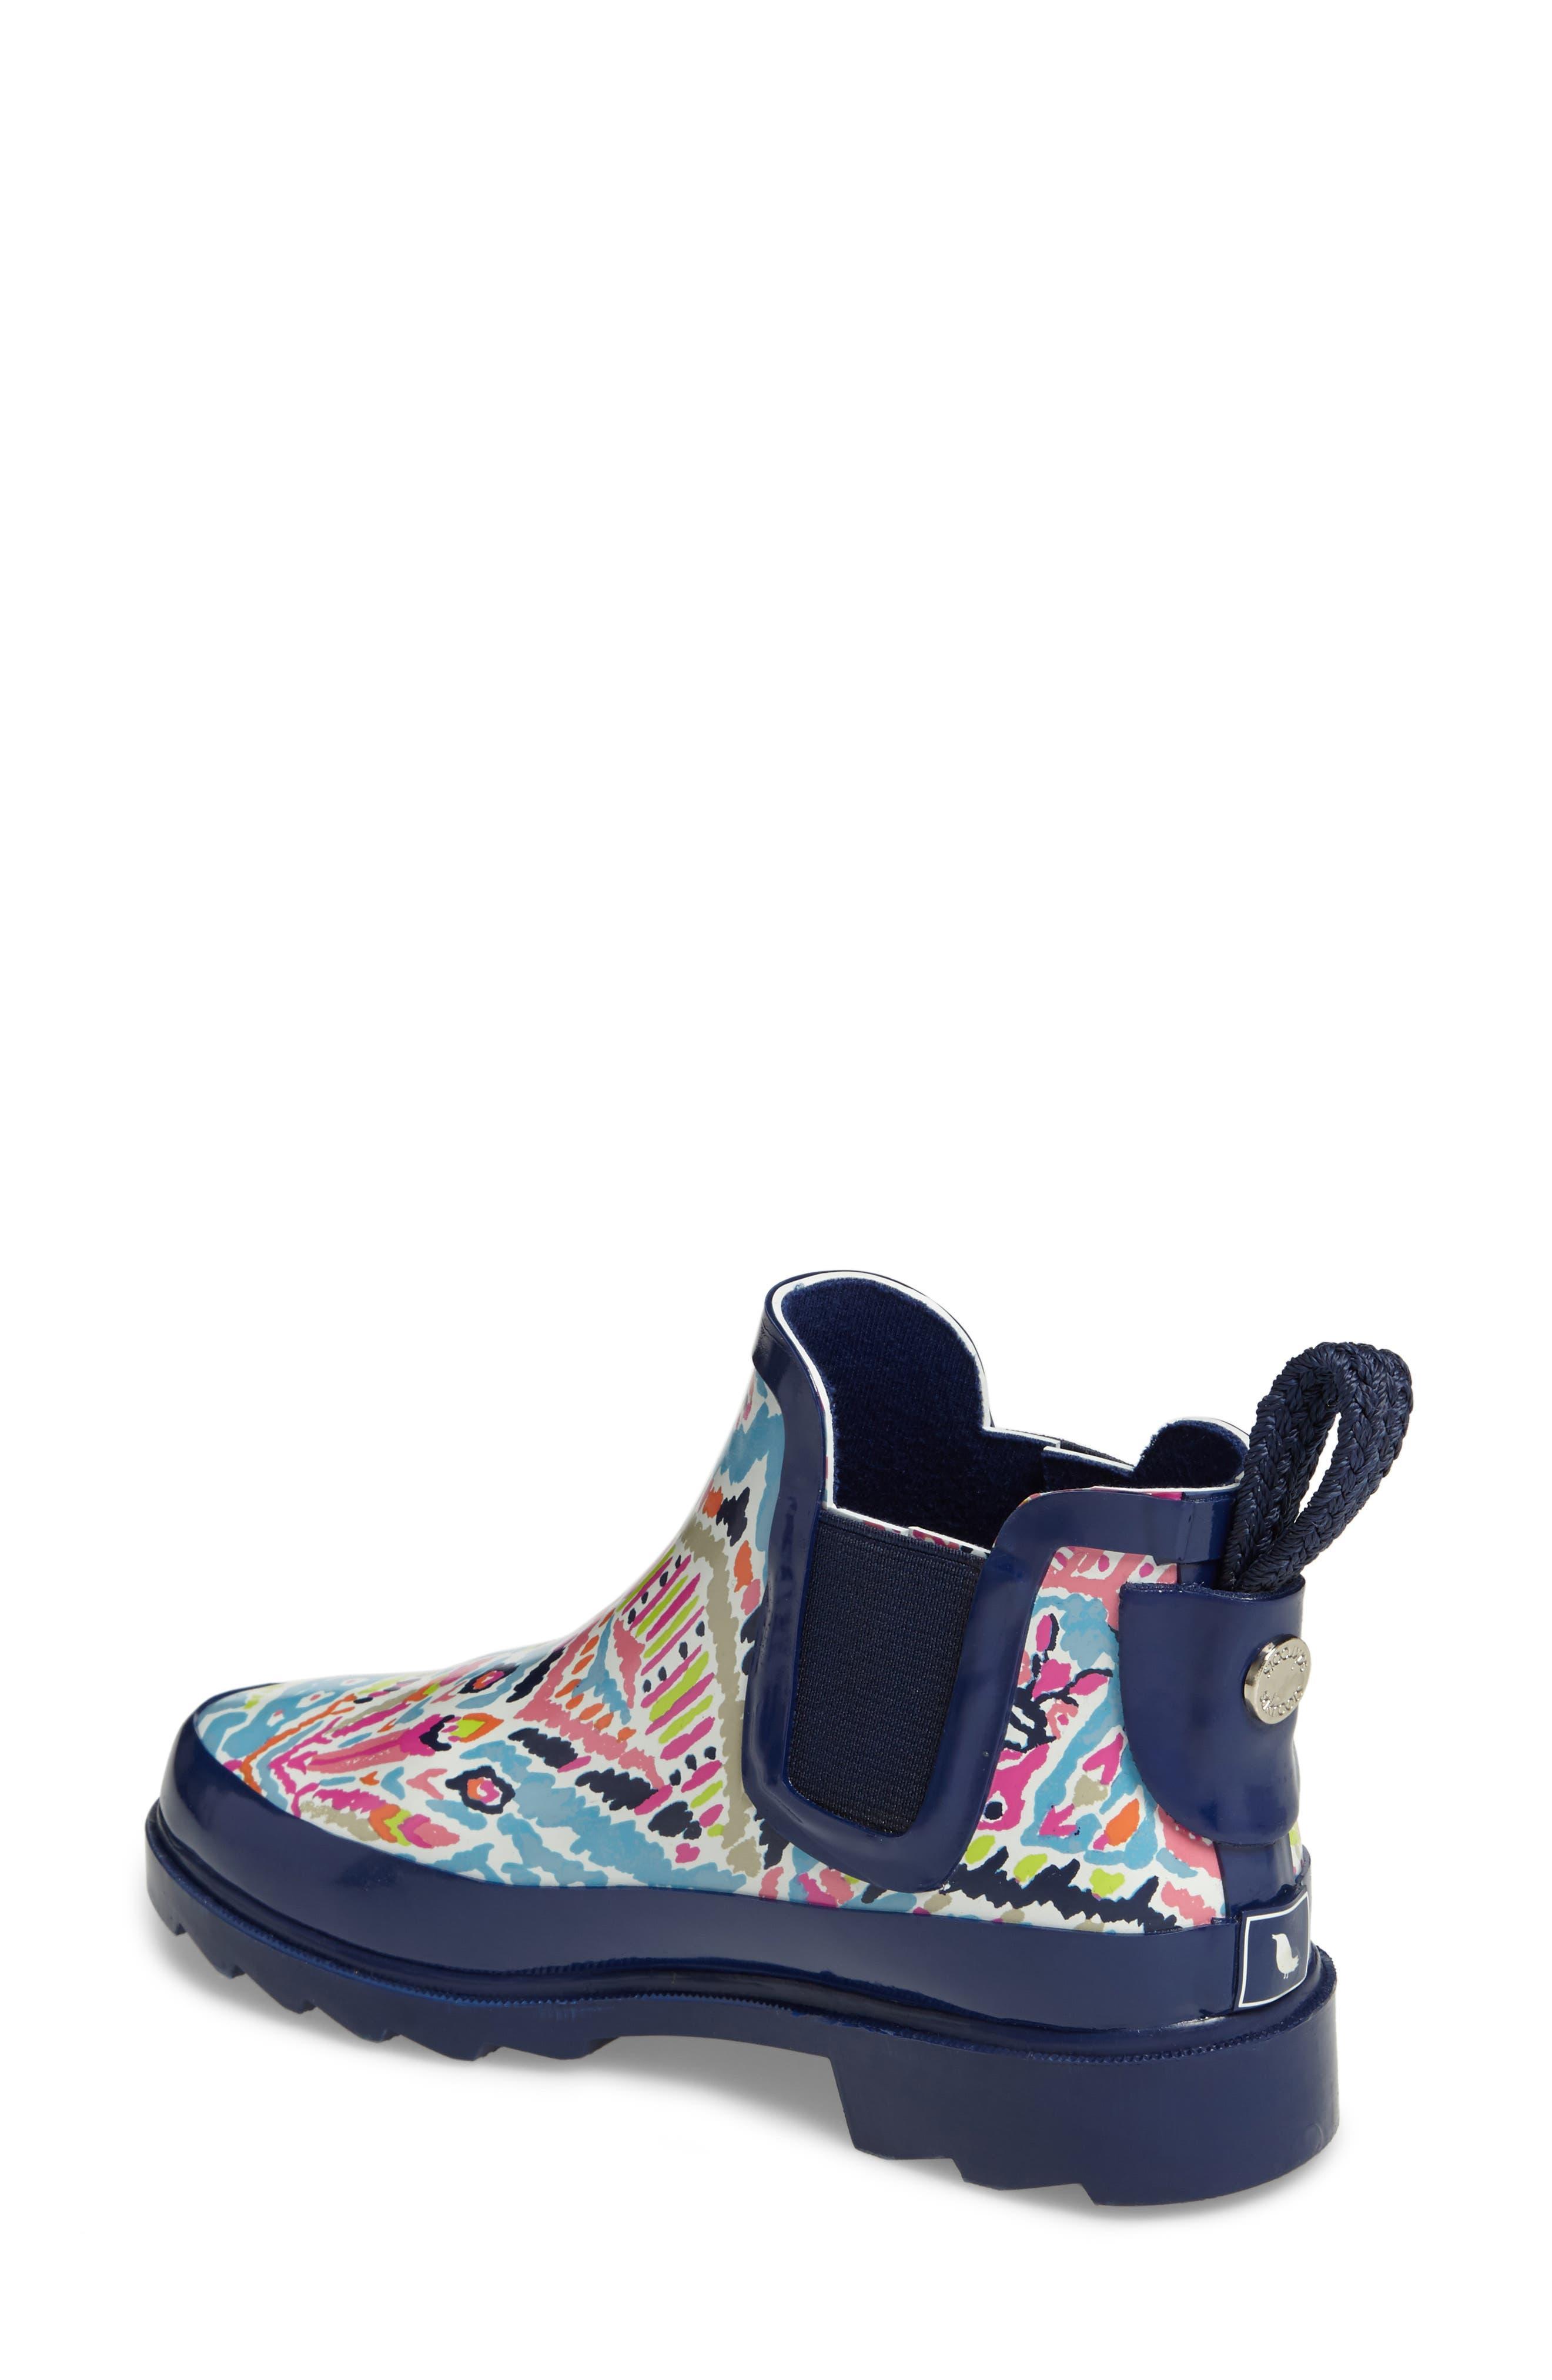 'Rhyme' Waterproof Rain Boot,                             Alternate thumbnail 36, color,